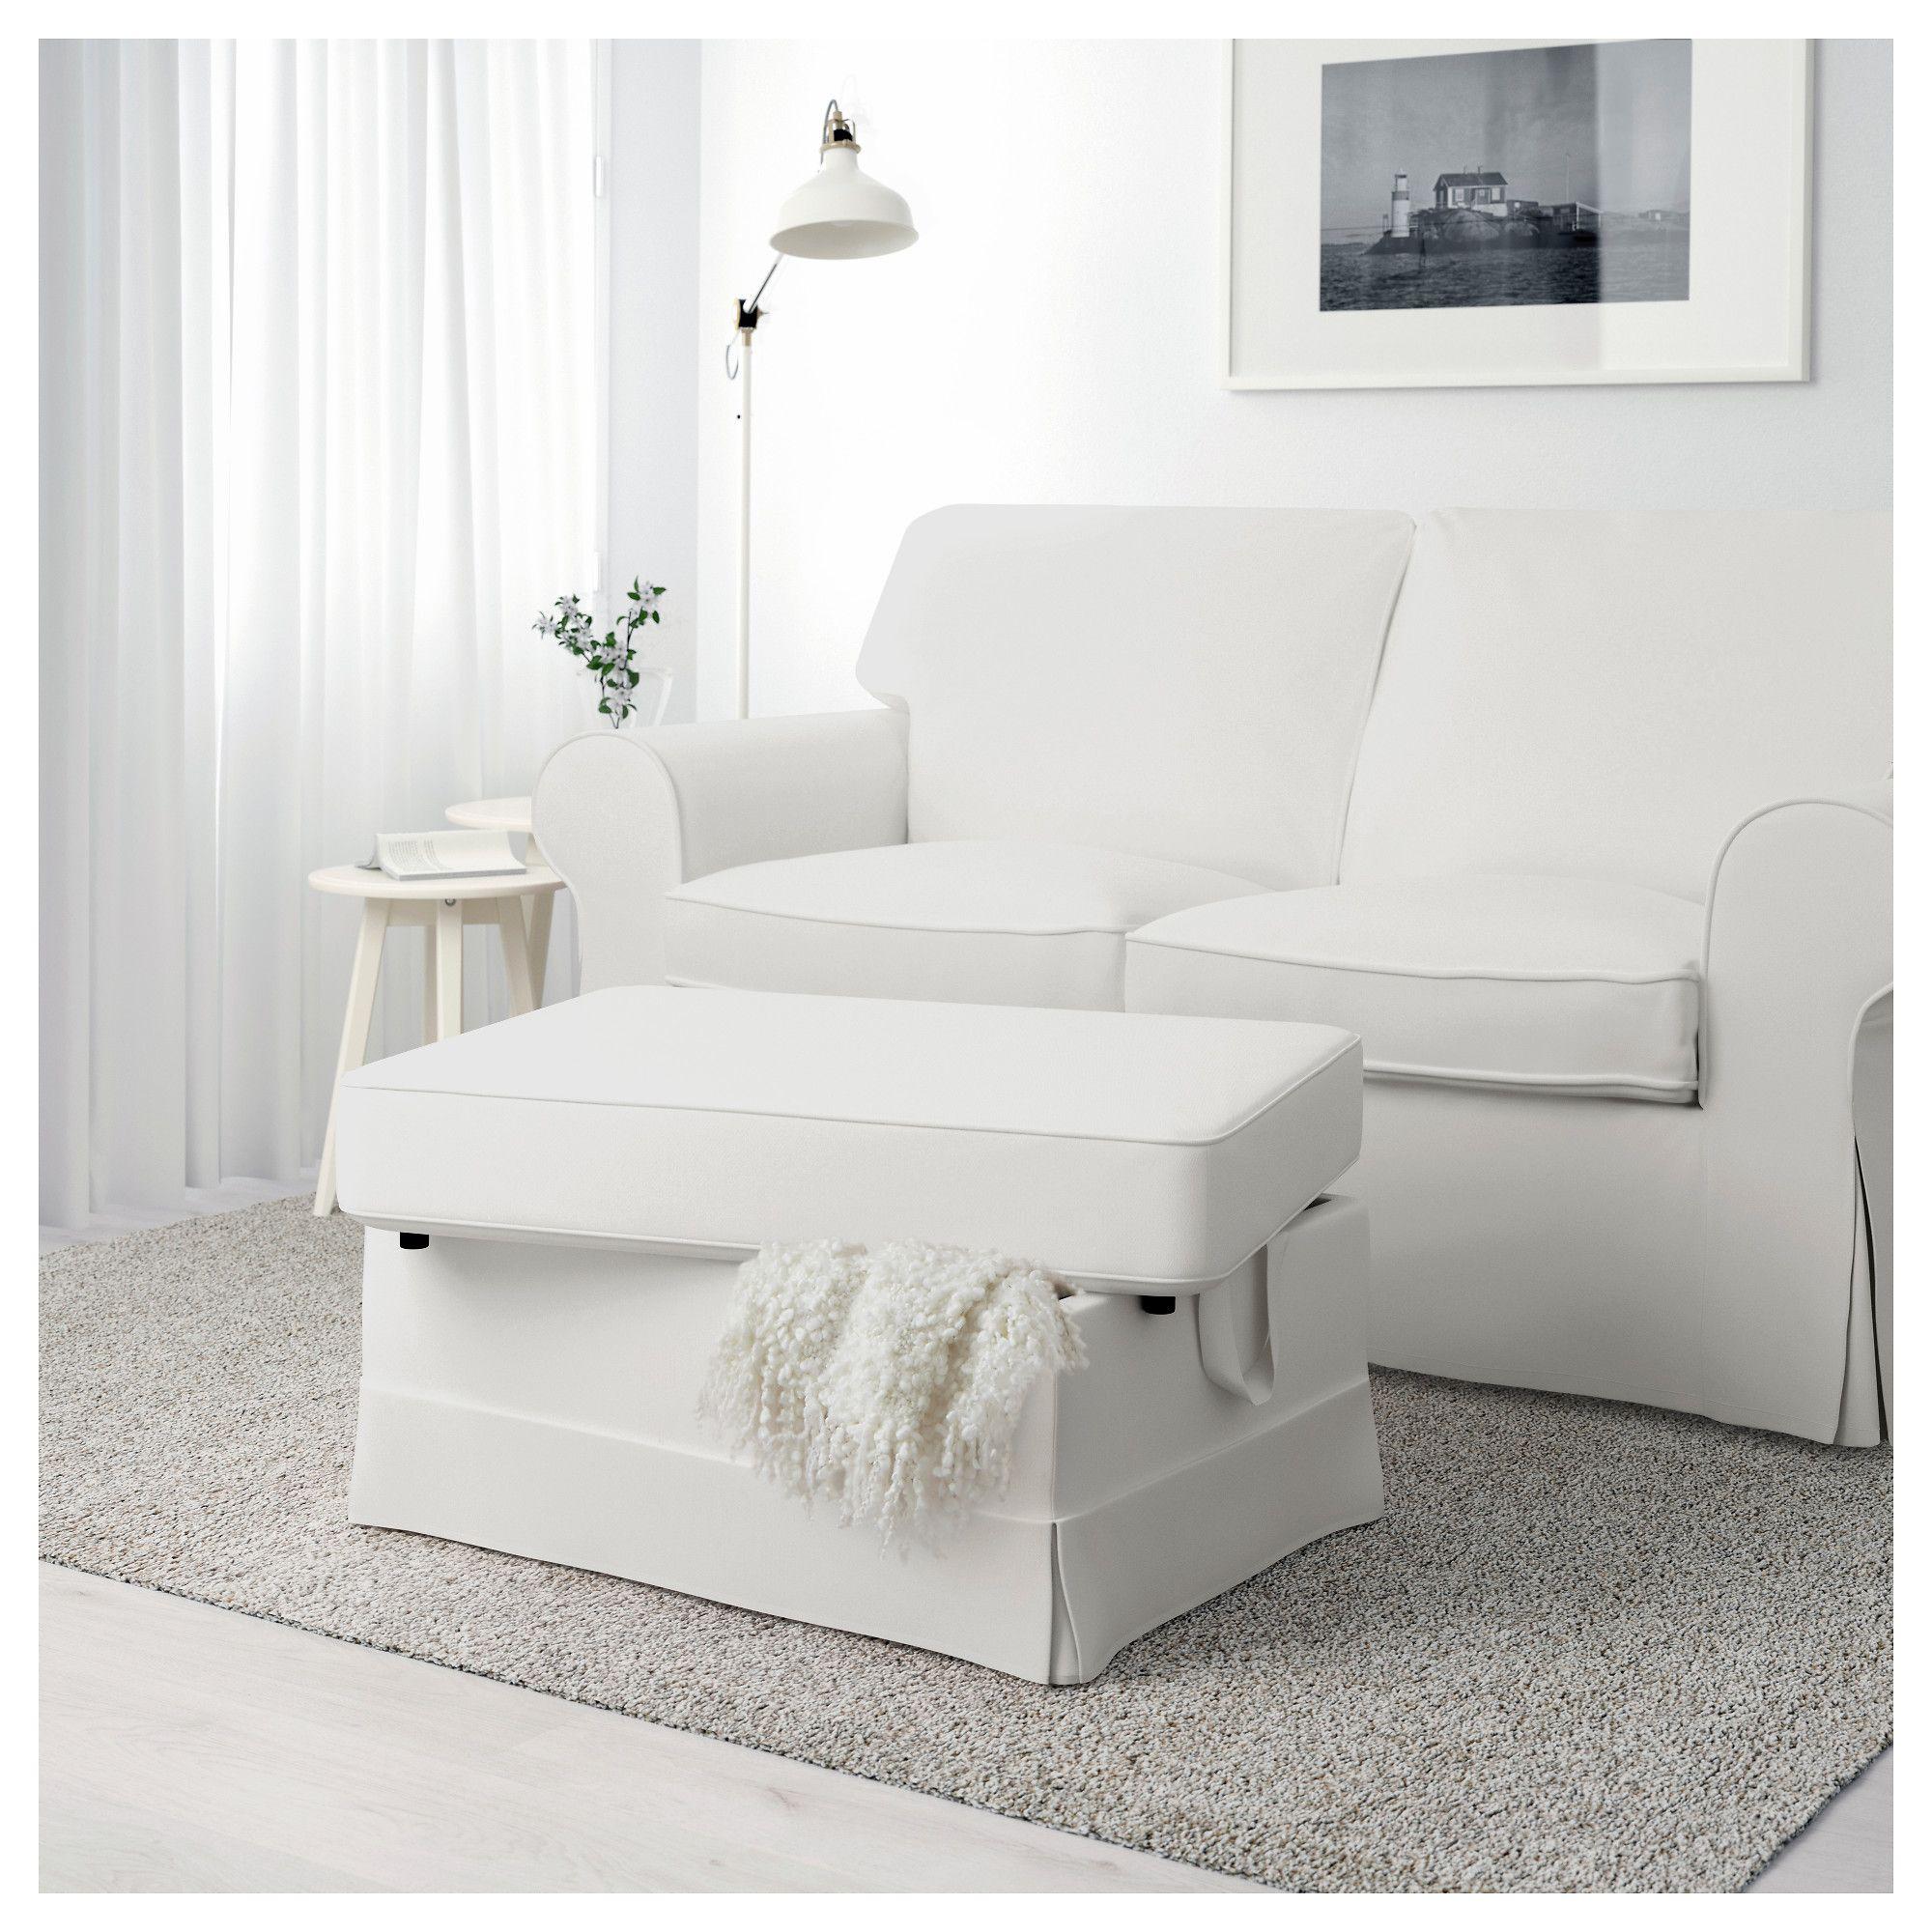 Ektorp Footstool Vittaryd White Wohnzimmer Sofa Ikea Hocker